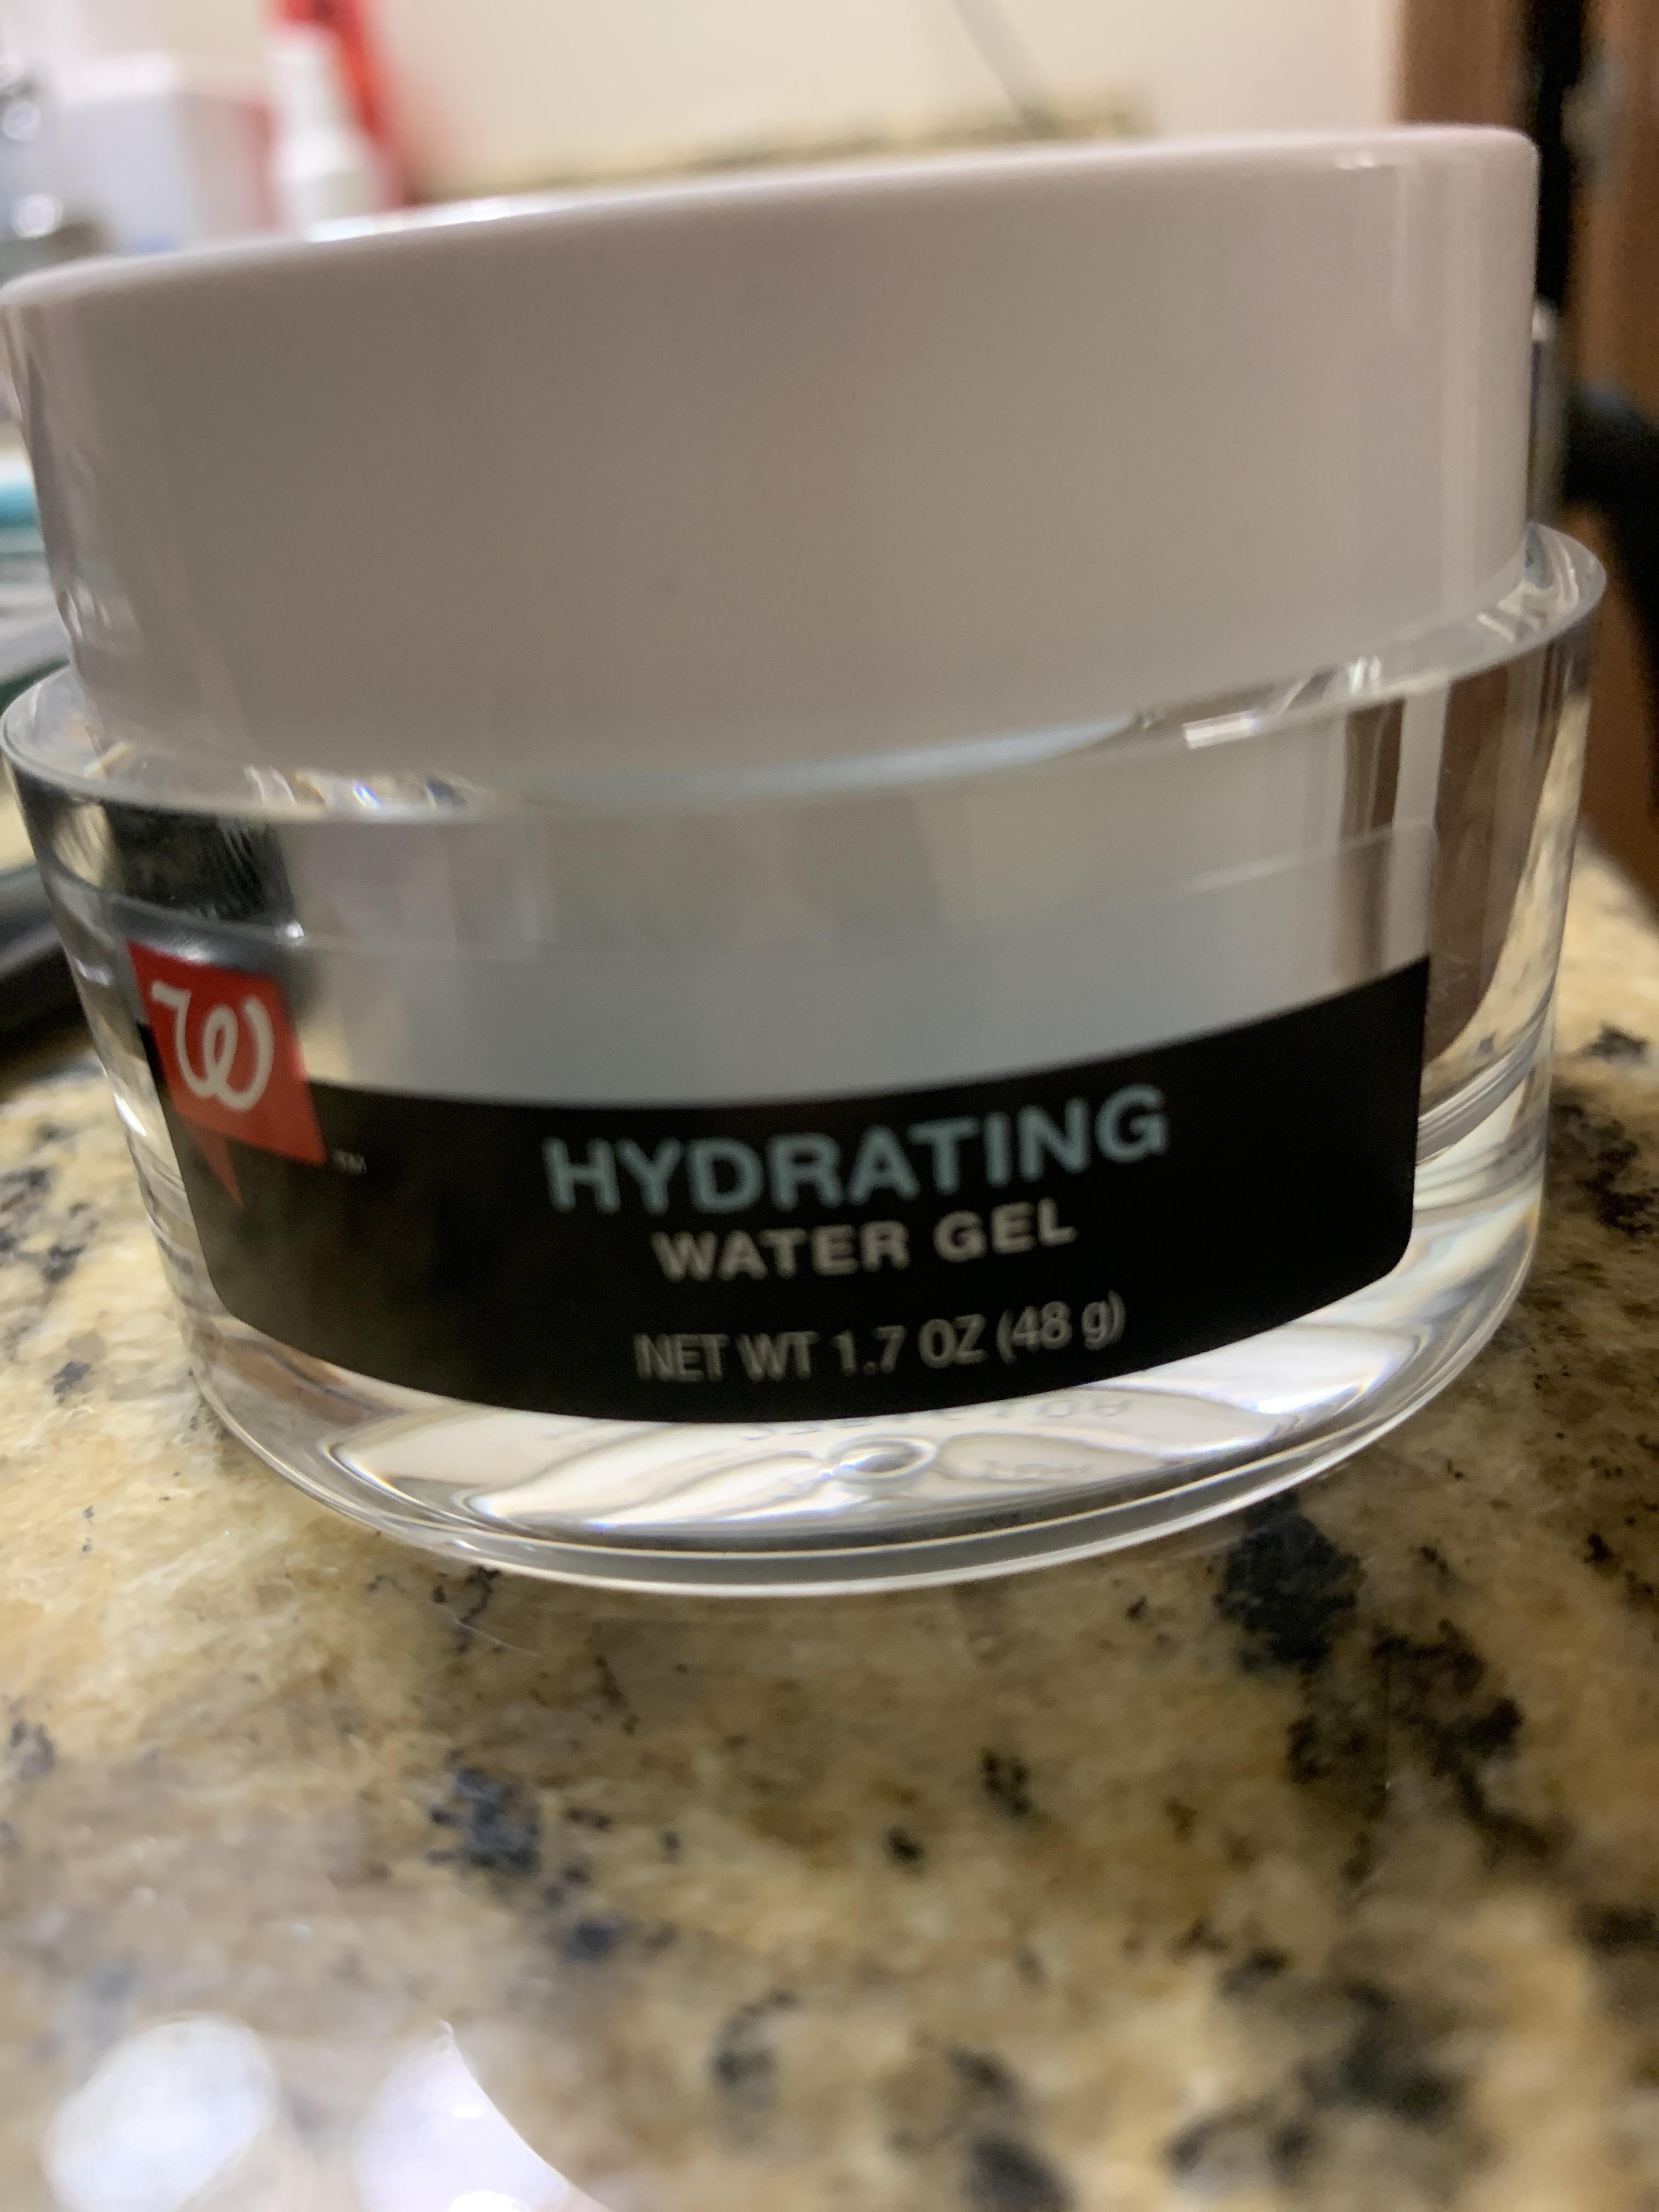 Walgreens Hydrating Water Gel